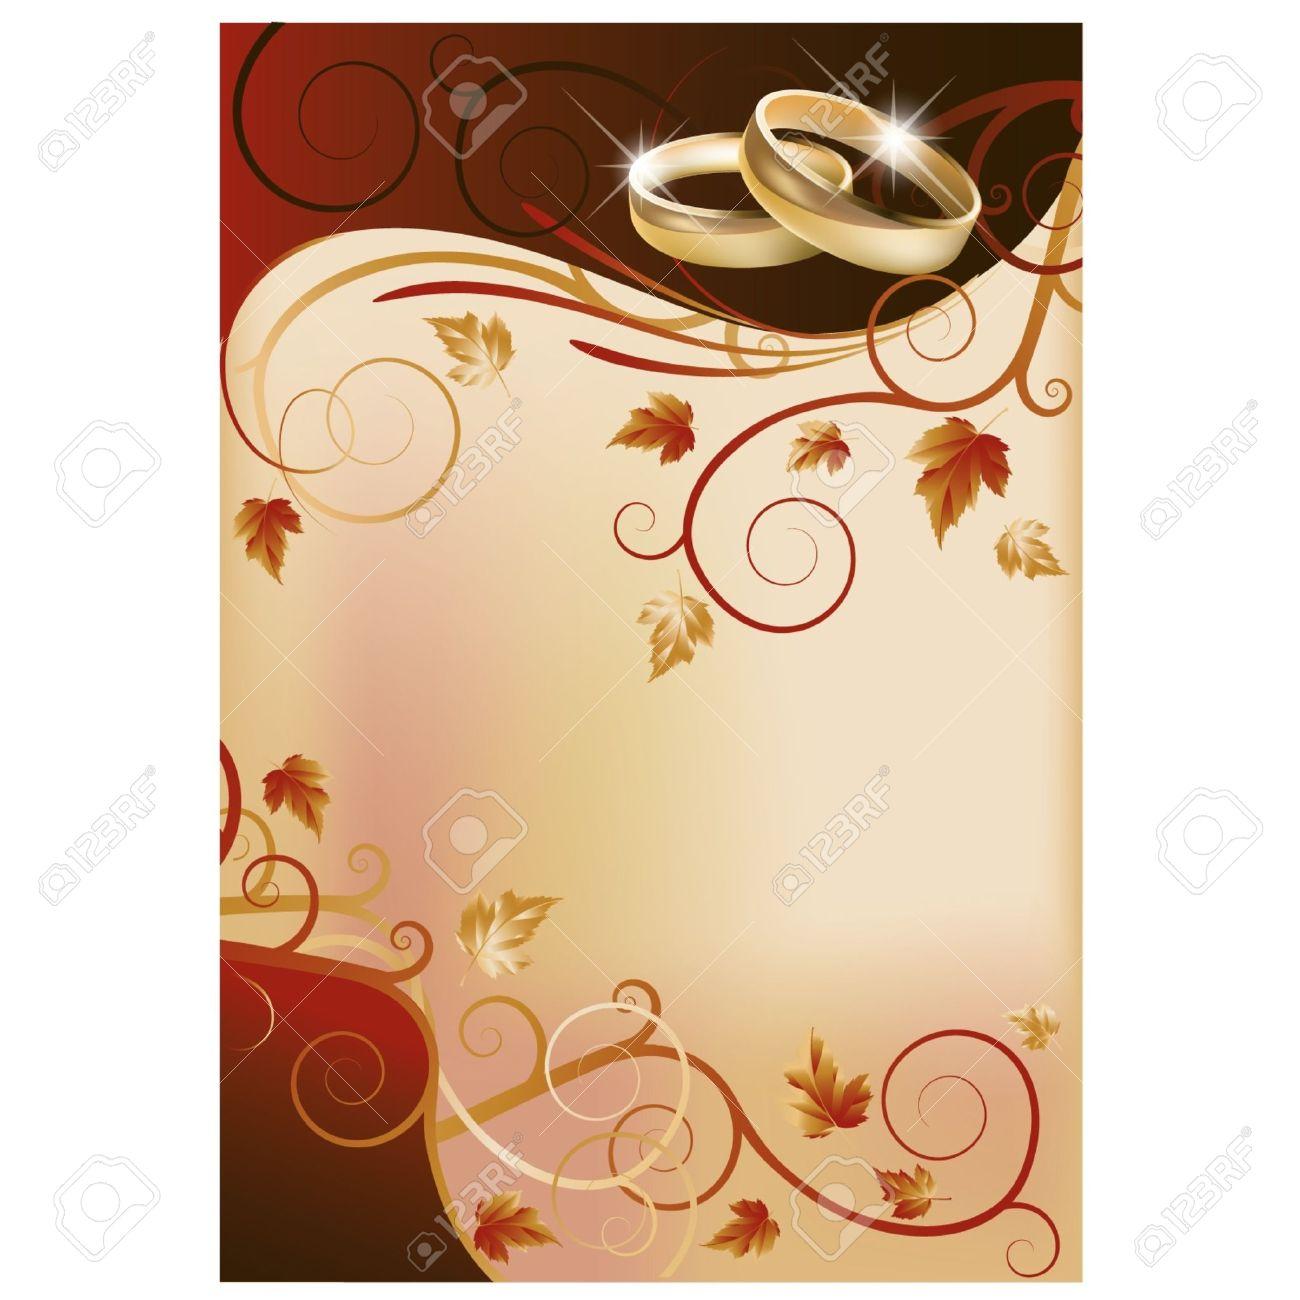 Autumn Wedding Invitation Card Royalty Free Cliparts, Vectors, And ...